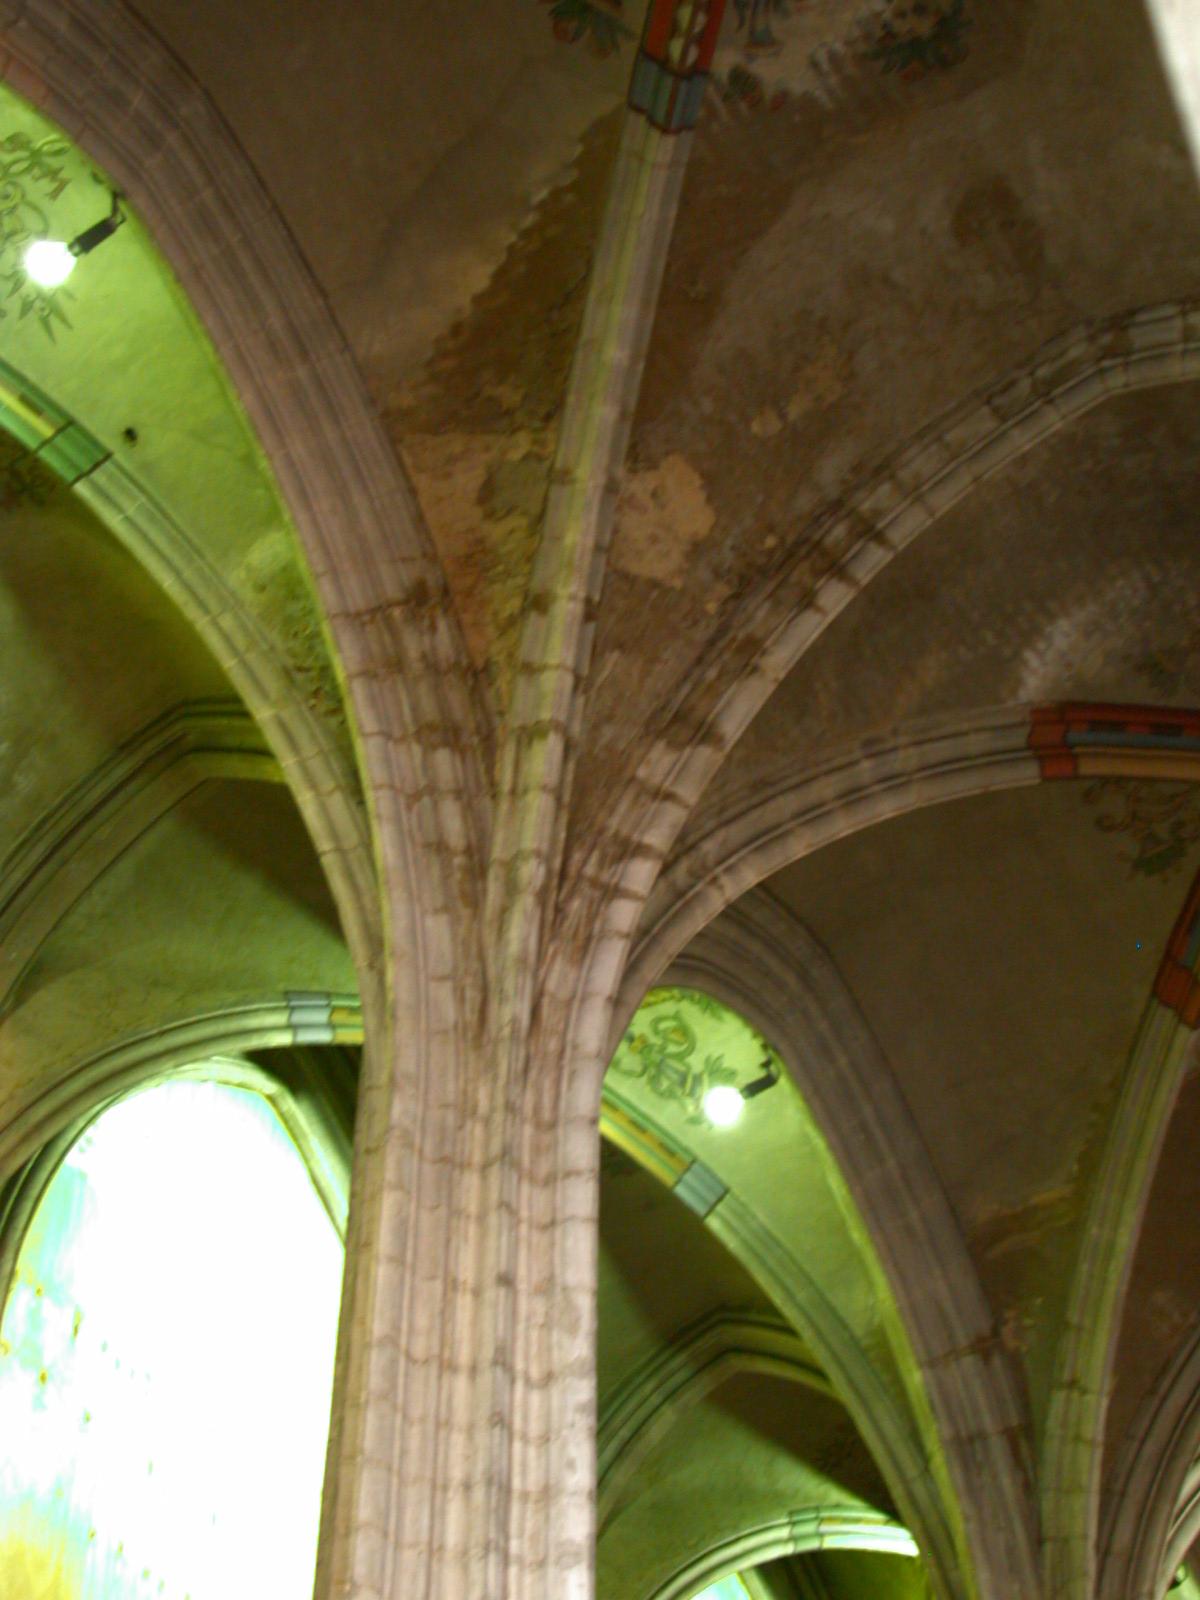 architecture interiors column pillar church cathedral gothic ceiling